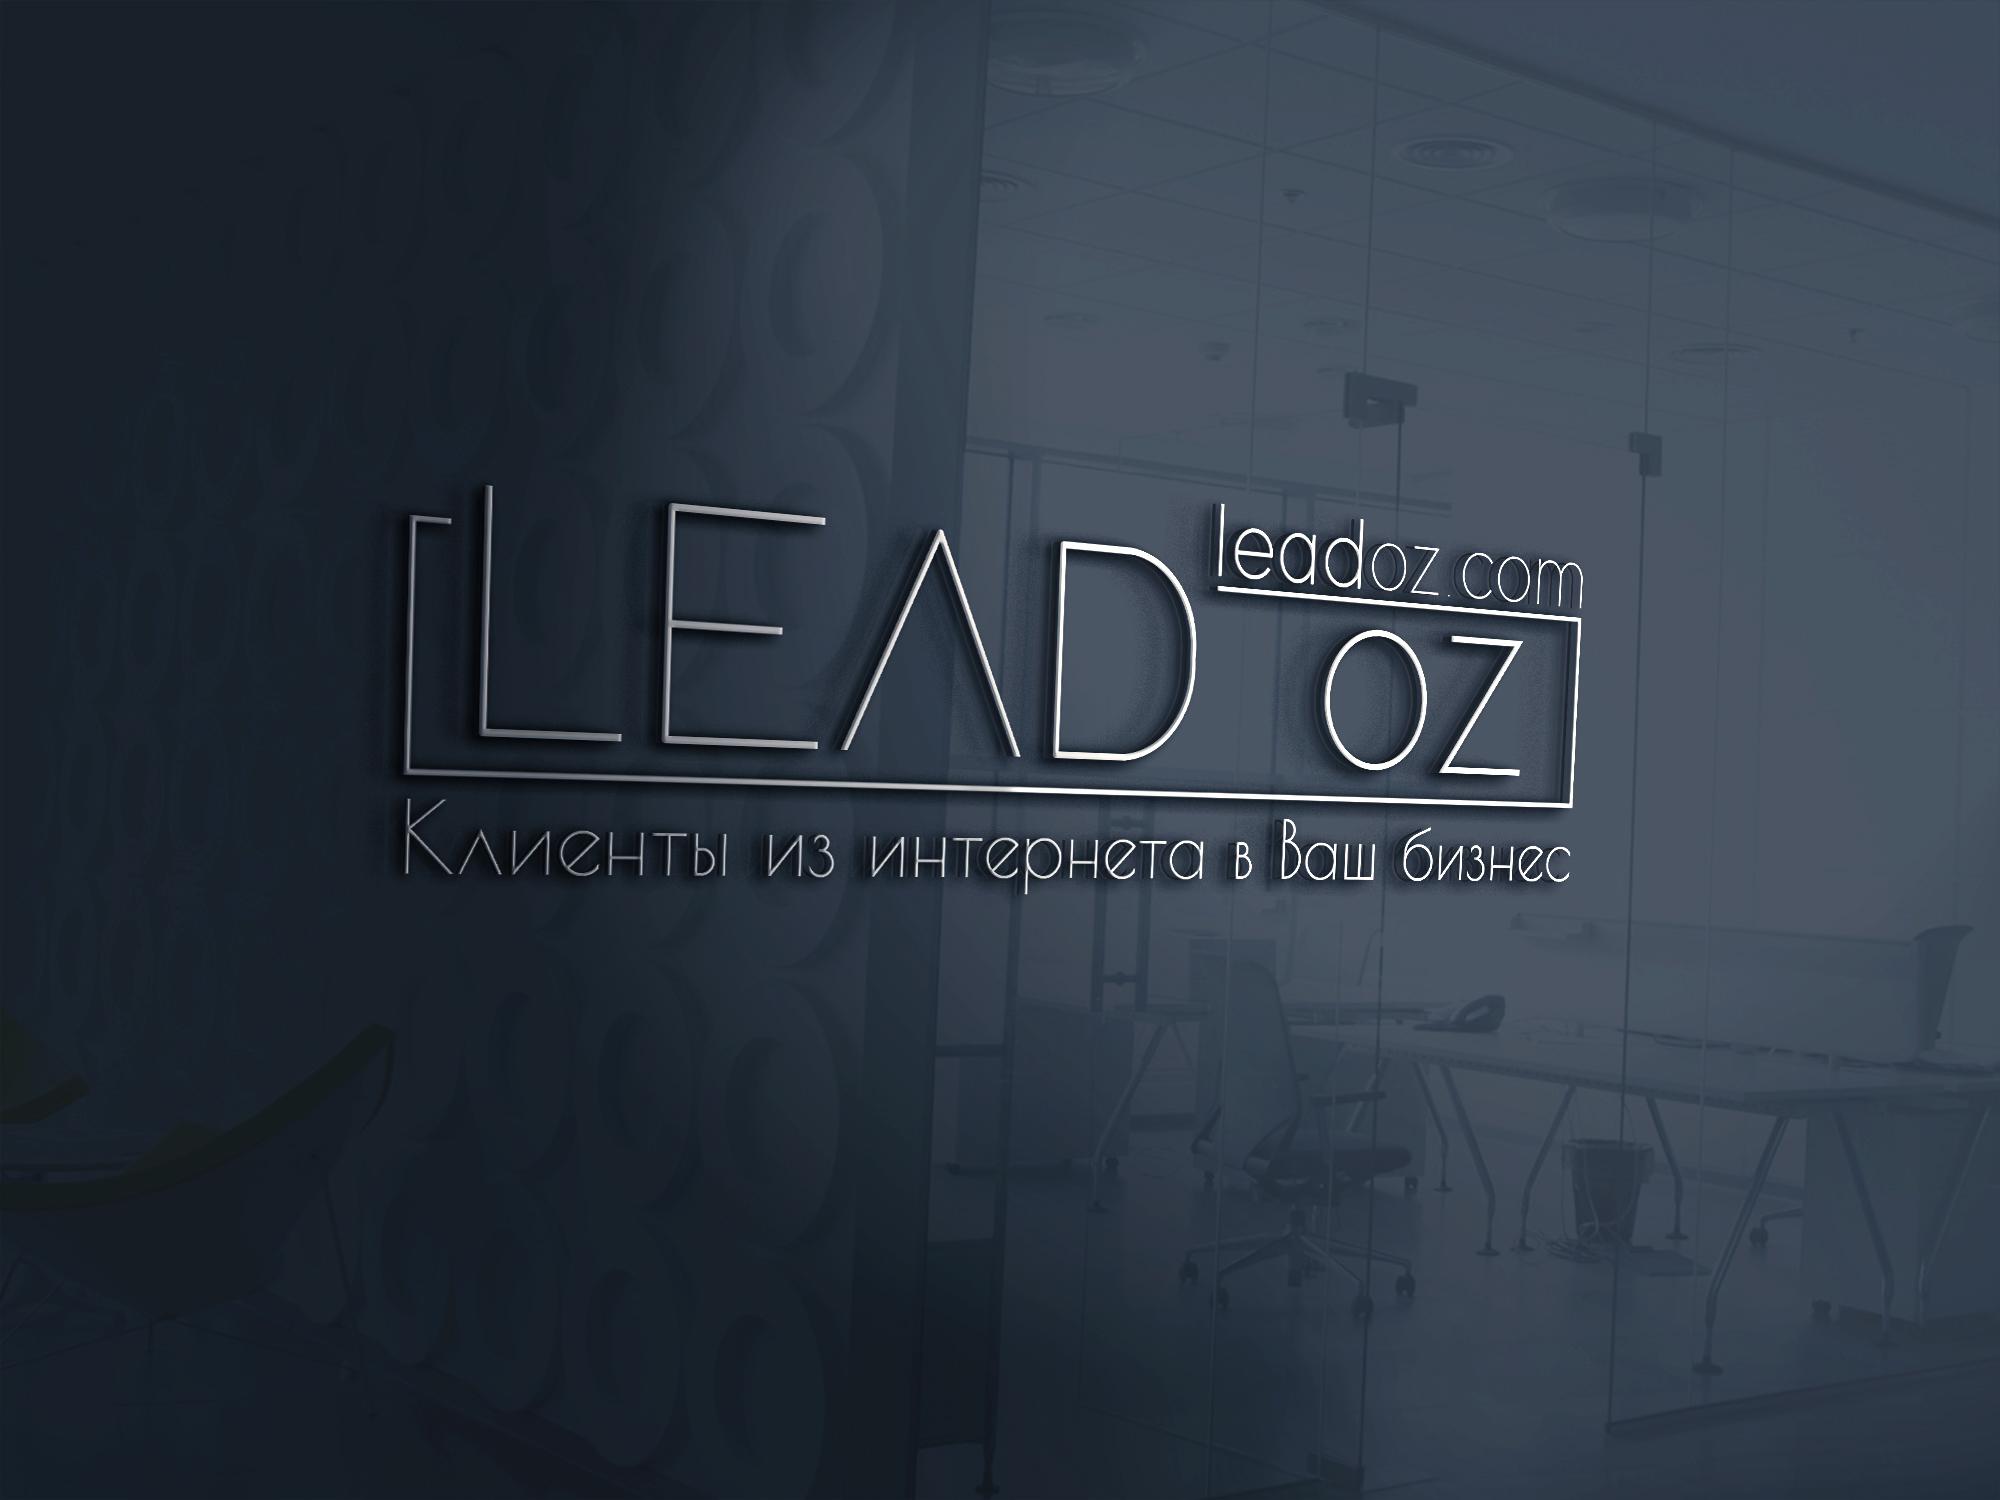 LeadOZ